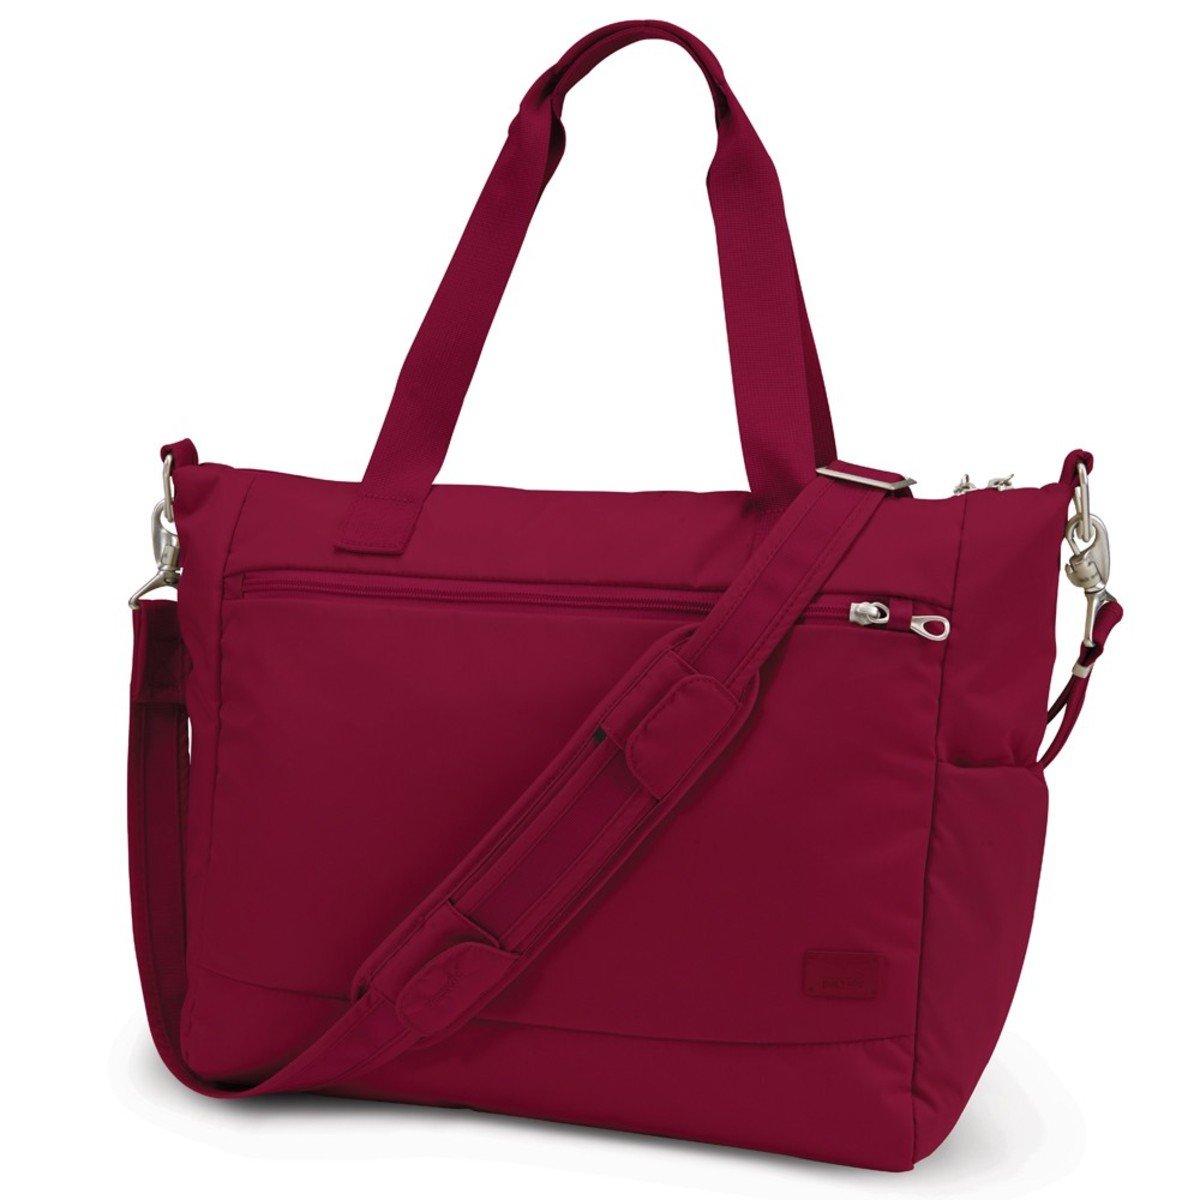 Citysafe CS400 防盜旅行斜揹手提袋 (紅色)